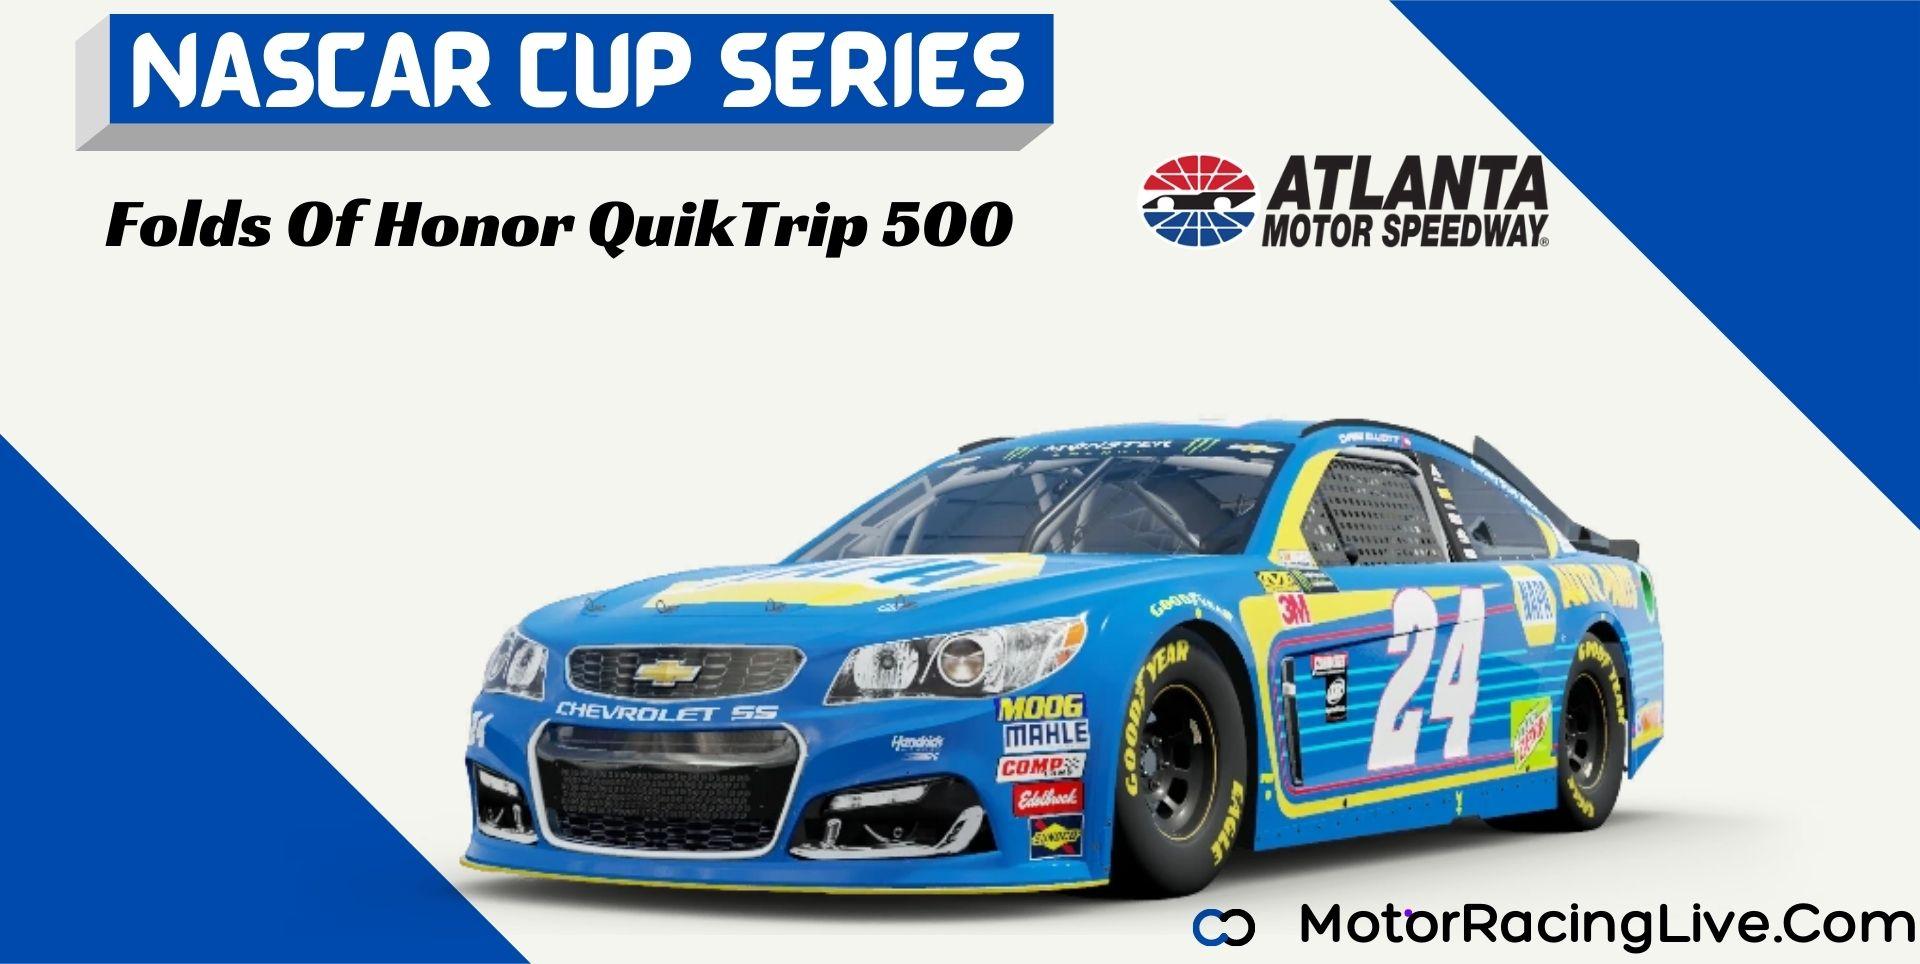 Folds Of Honor QuikTrip 500 Nascar Cup 2021 Live Stream